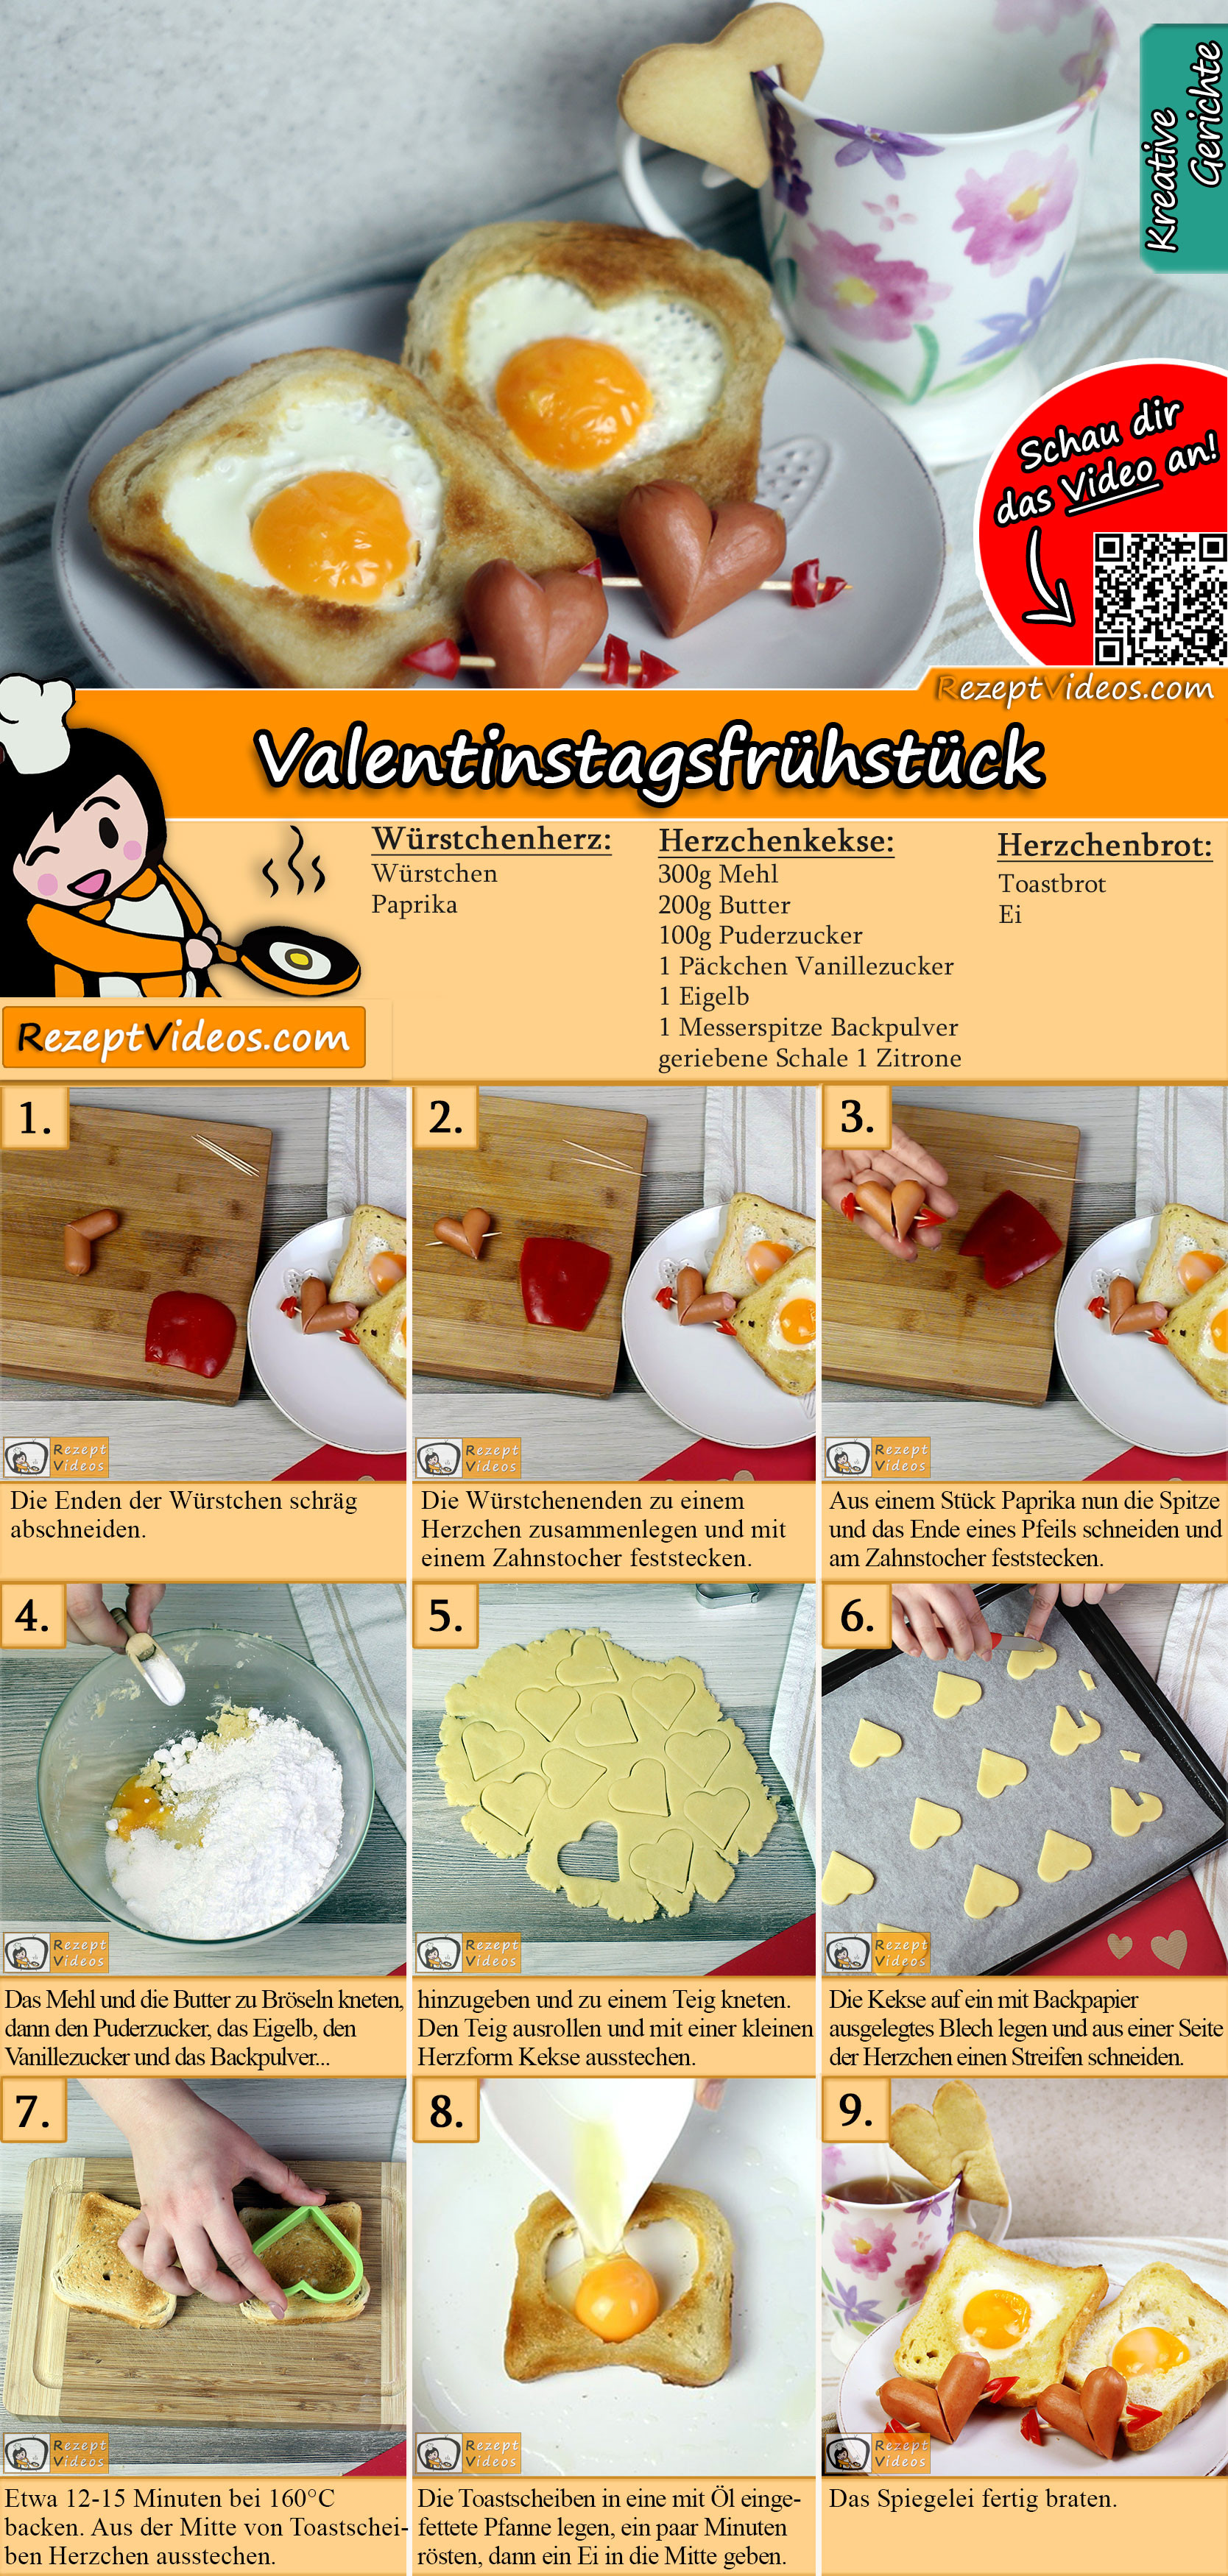 Valentinstagsfrühstück Rezept mit Video